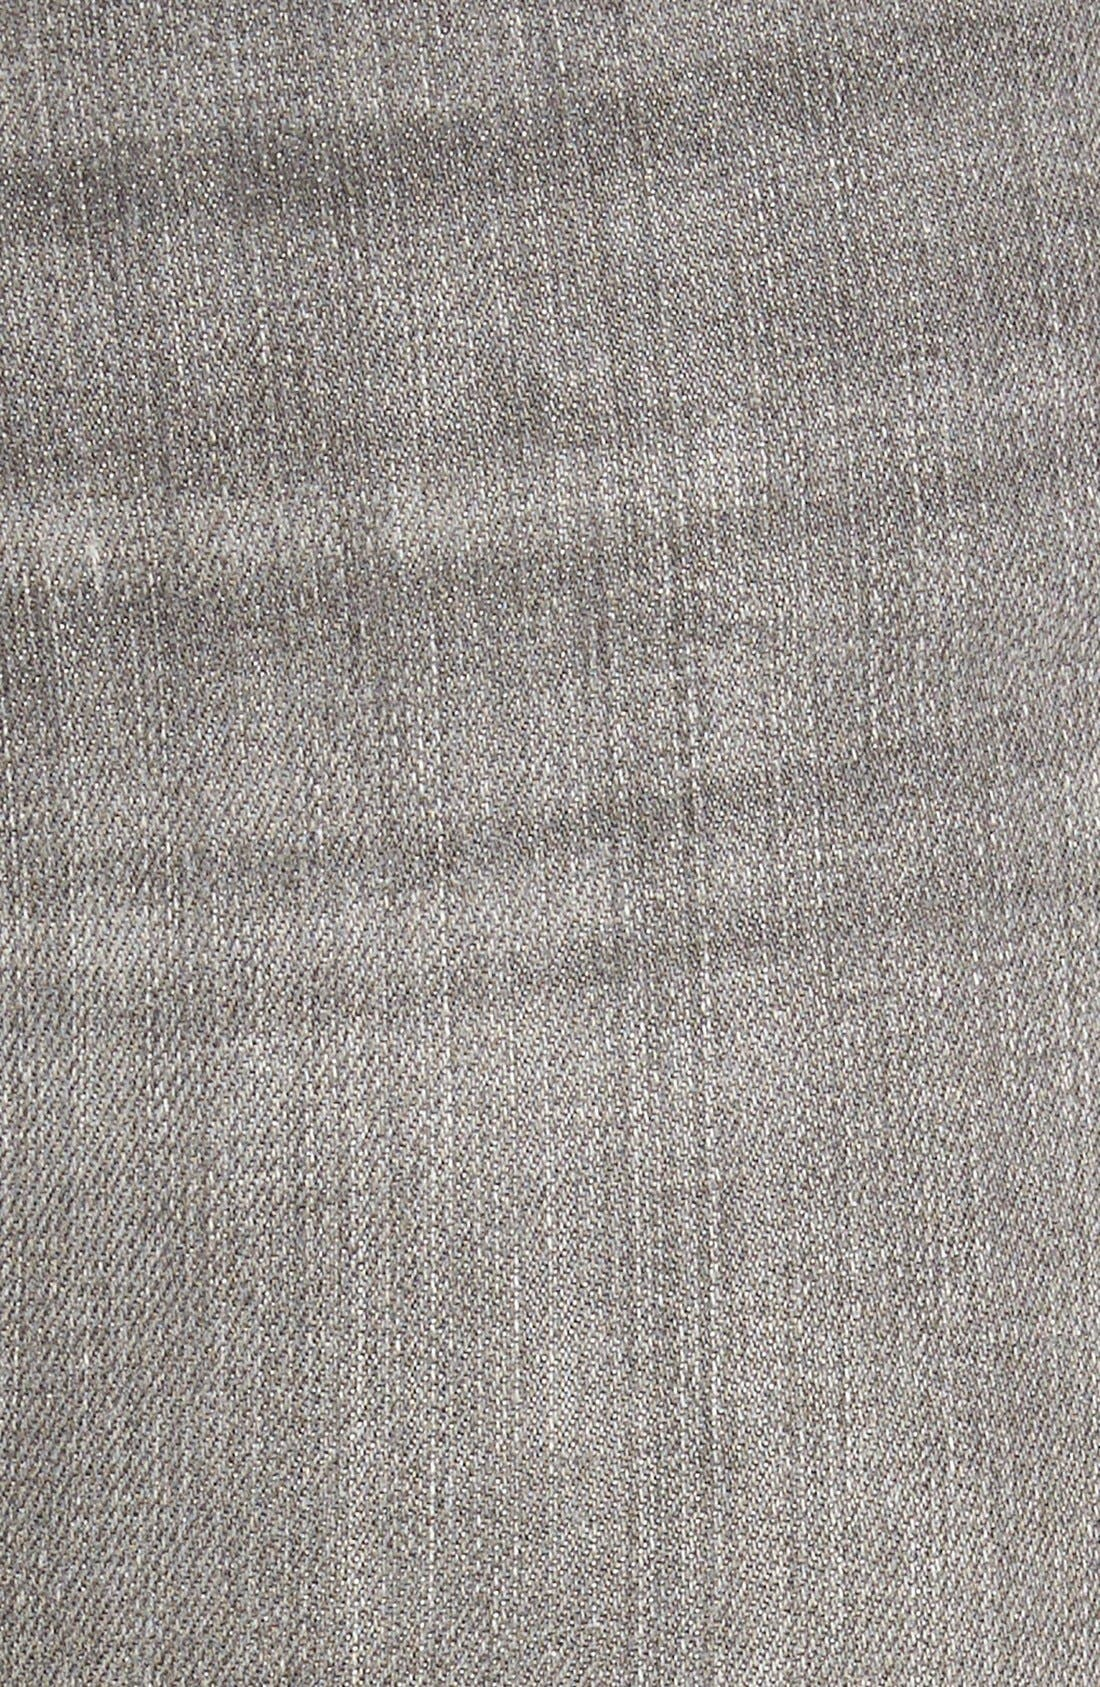 Alternate Image 5  - Mavi Jeans 'Serena' Distressed Stretch Skinny Jeans (Grey Ripped)